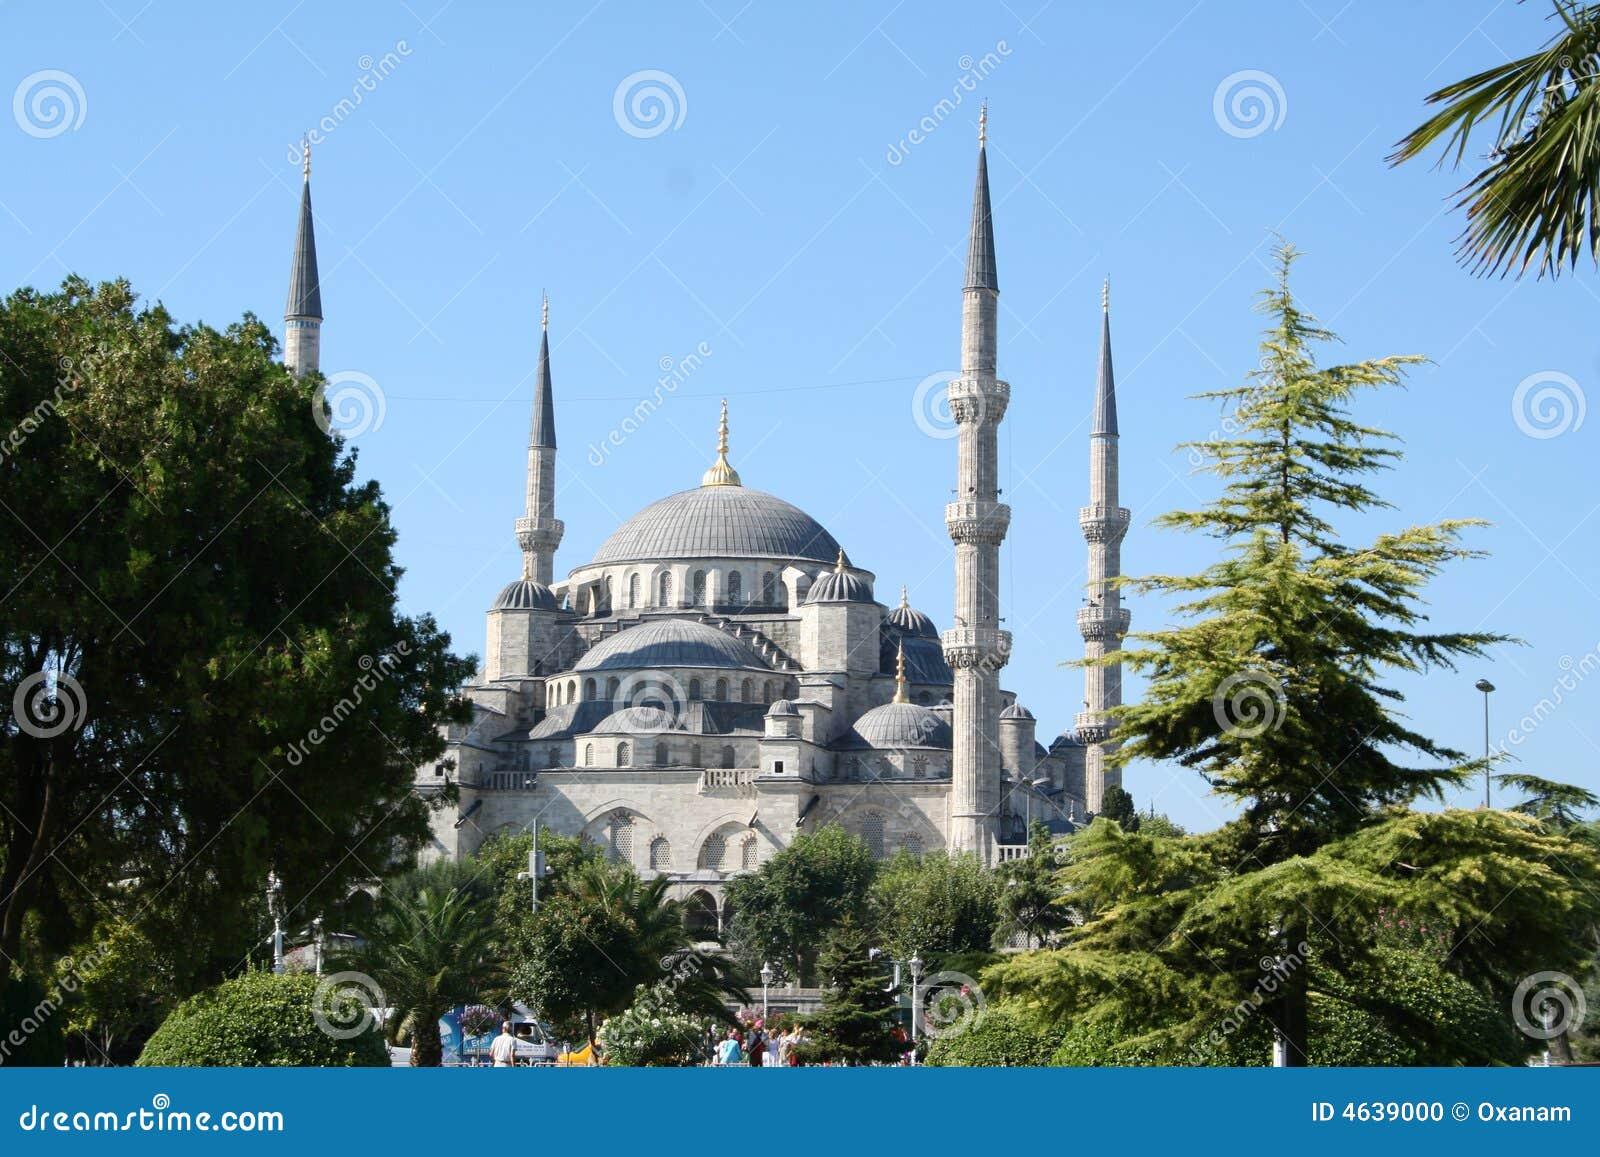 Turquia. Istambul. Mesquita azul